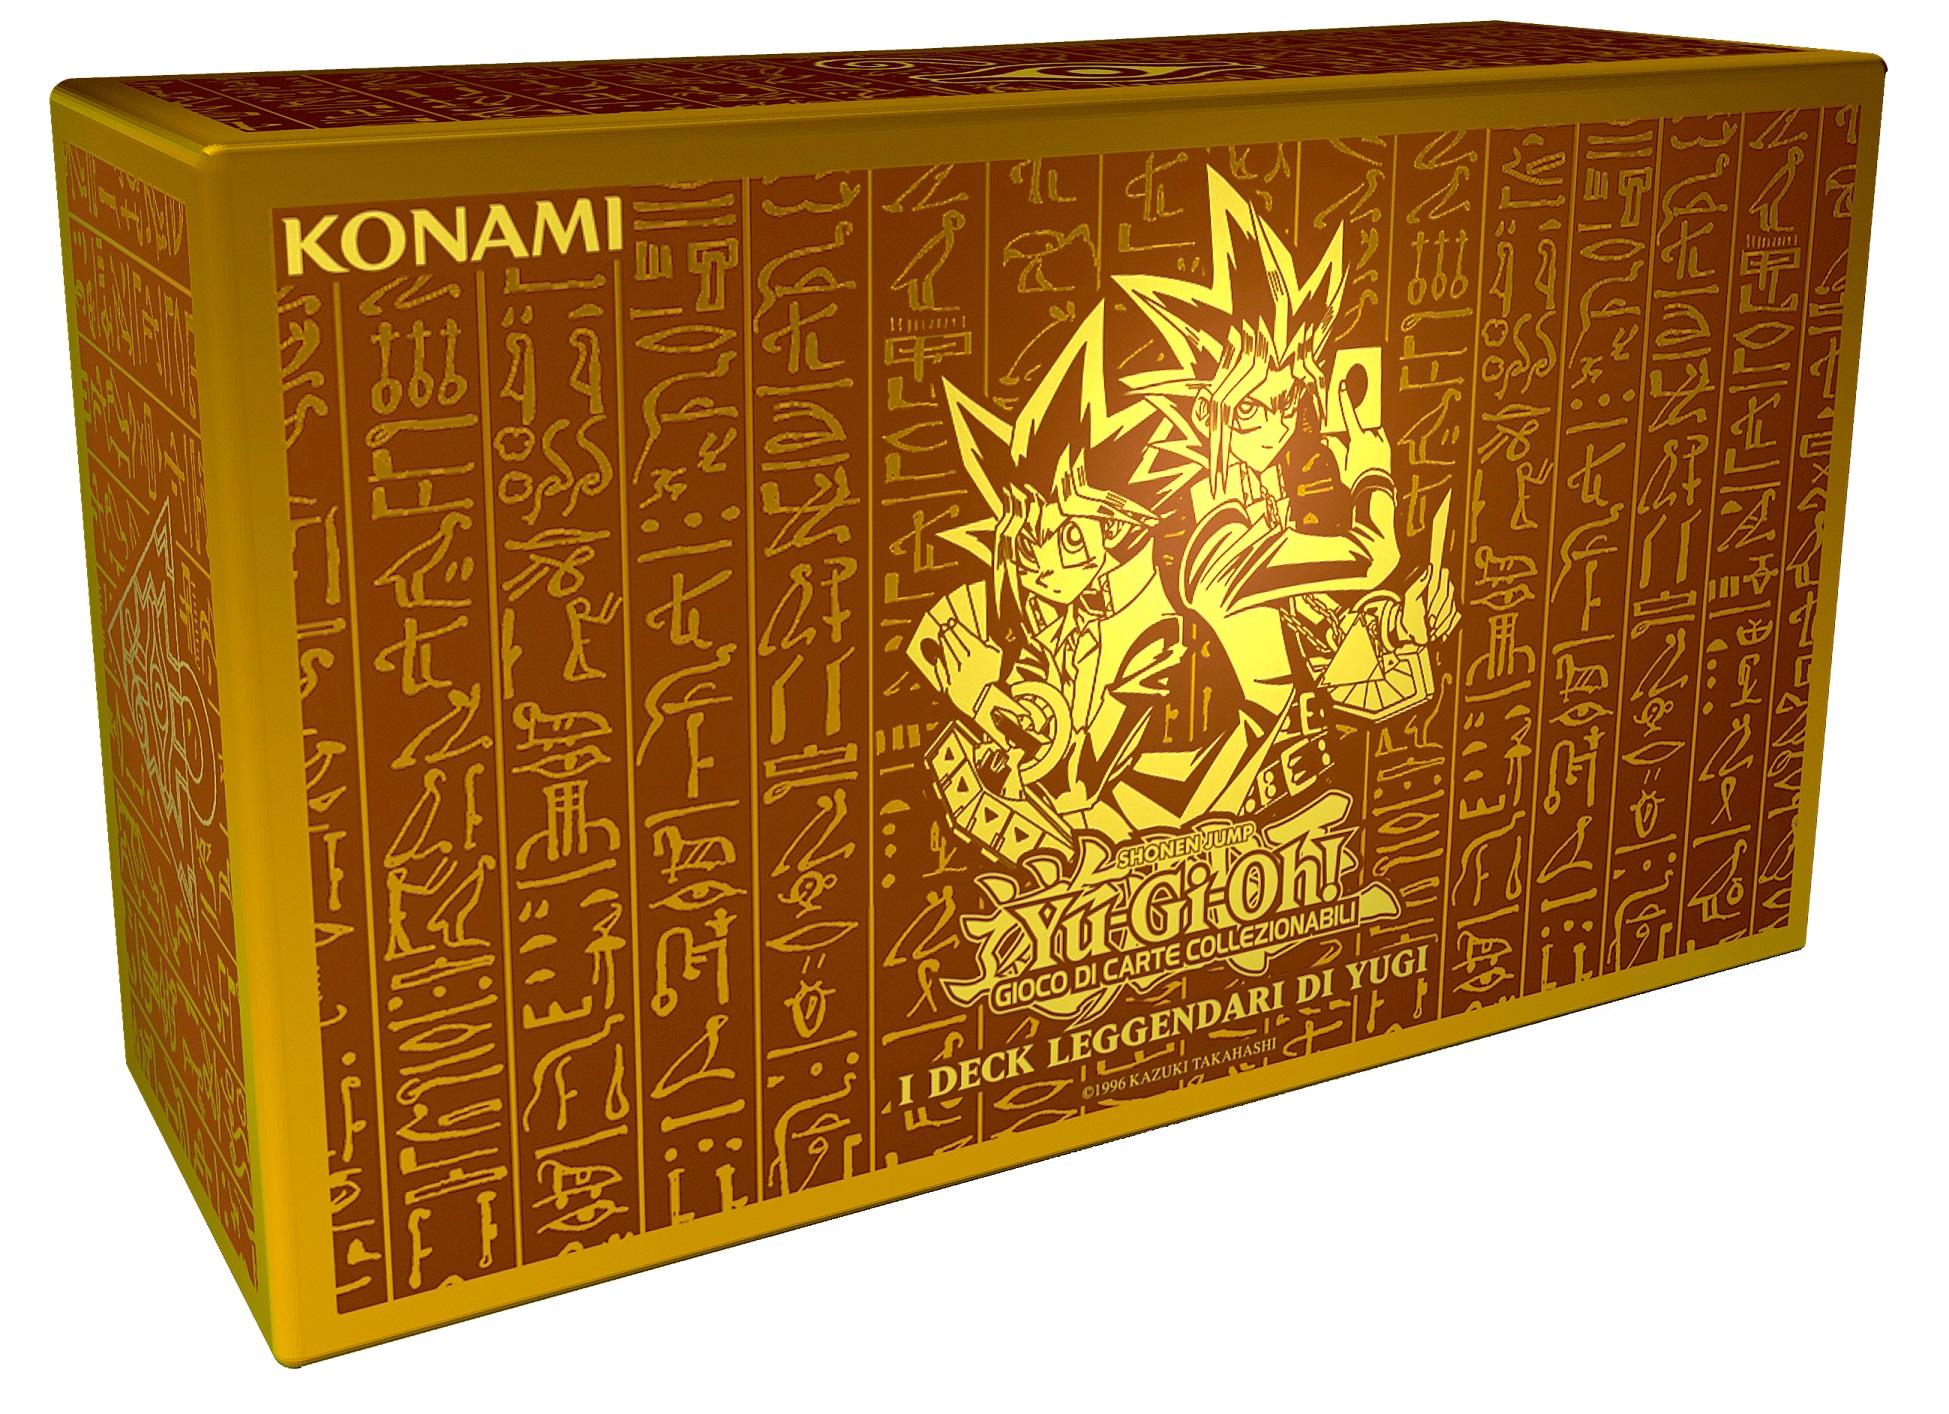 Yu-Gi-Oh Legendary decks